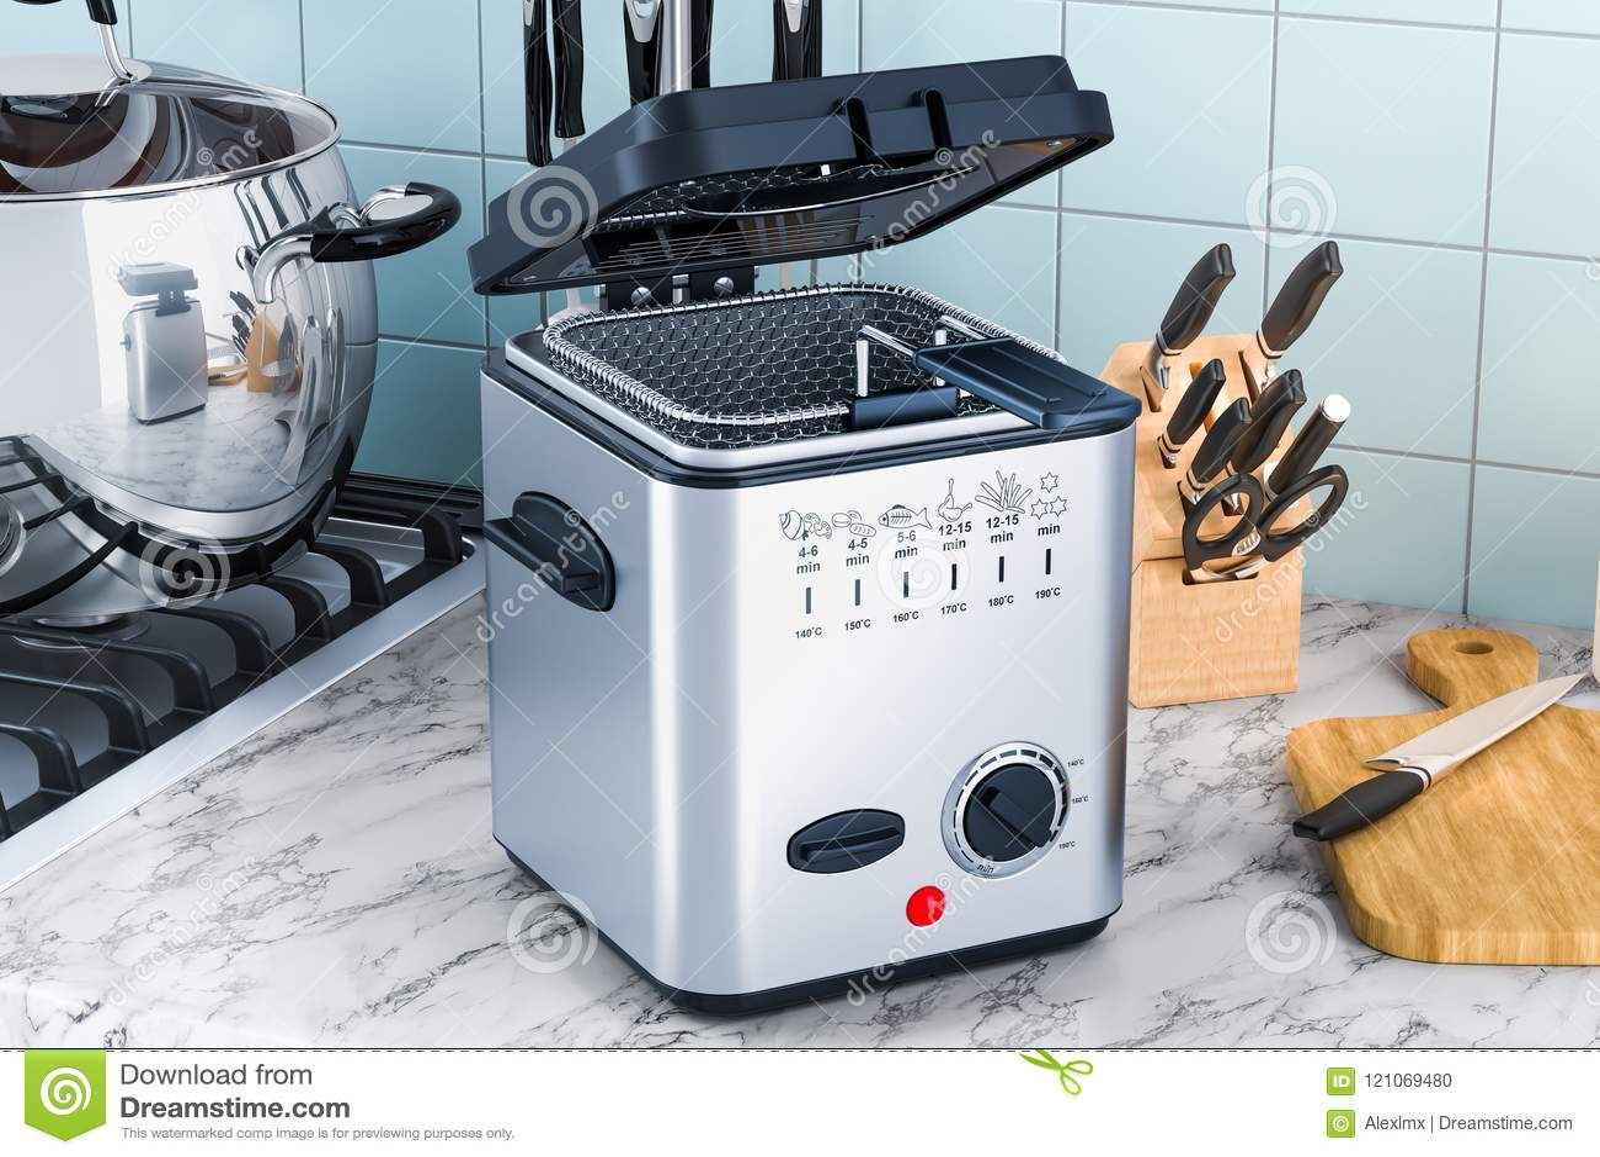 kitchen fryer facet 在厨房用桌上的国内深炸锅3d翻译库存例证 插画包括有电子 烹饪 技术 在厨房用桌上的国内深炸锅3d翻译